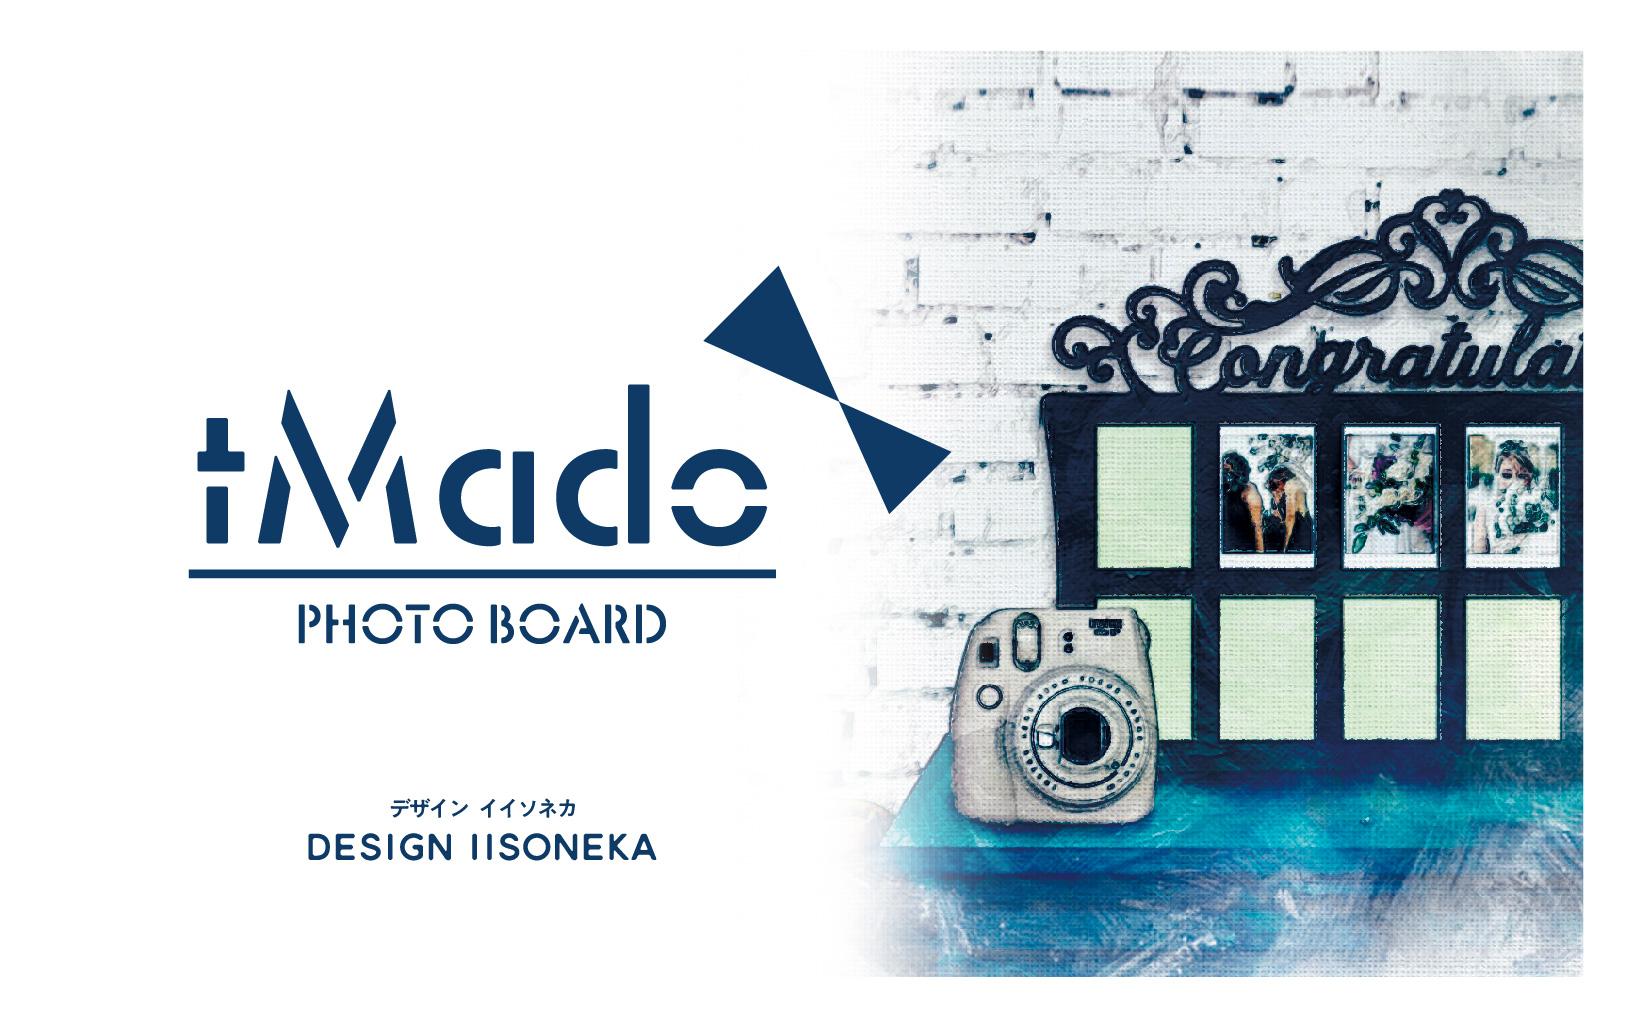 「tMado PHOTO BOARD  ショップカード」(名刺サイズ) メインイメージ